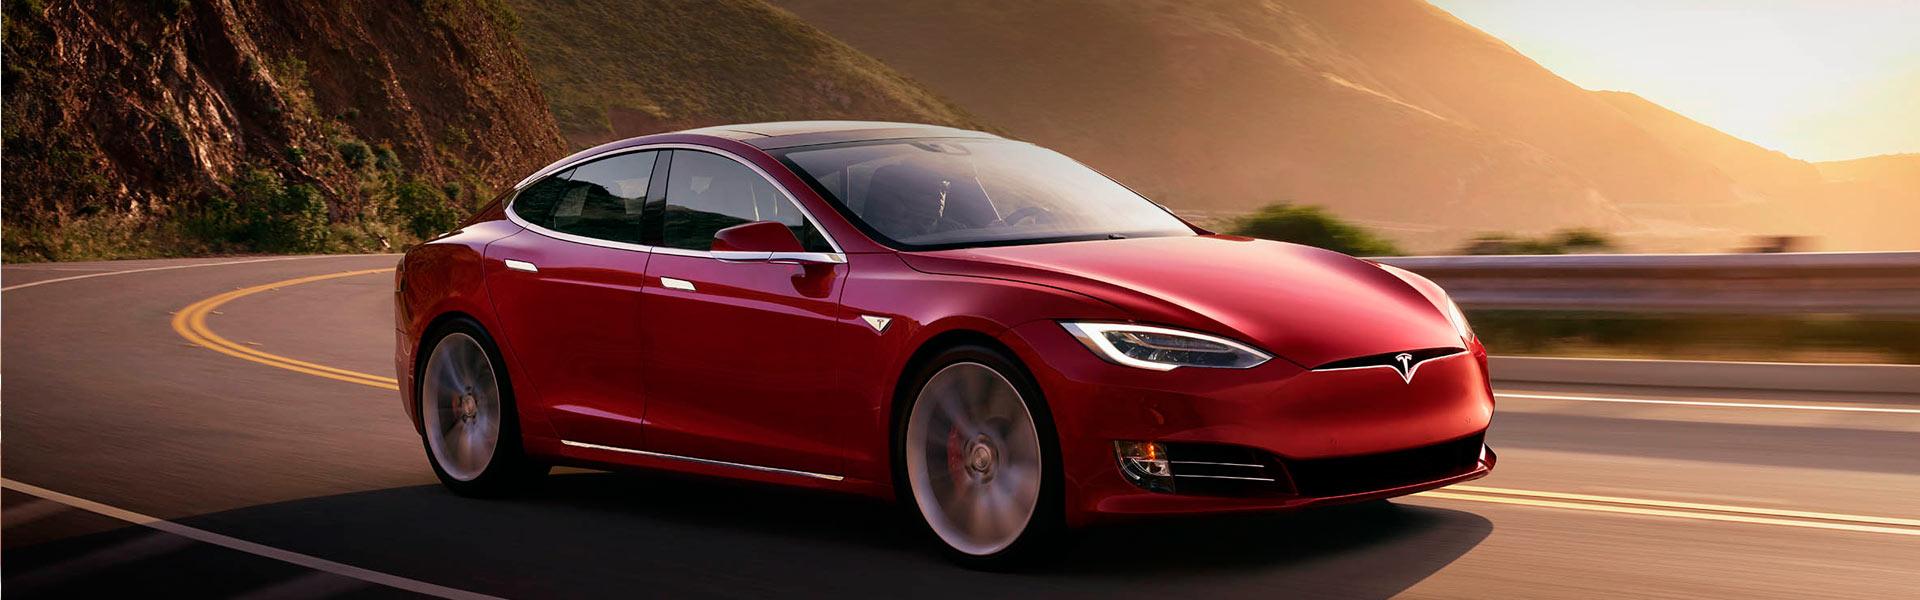 Сервис и ремонт Tesla